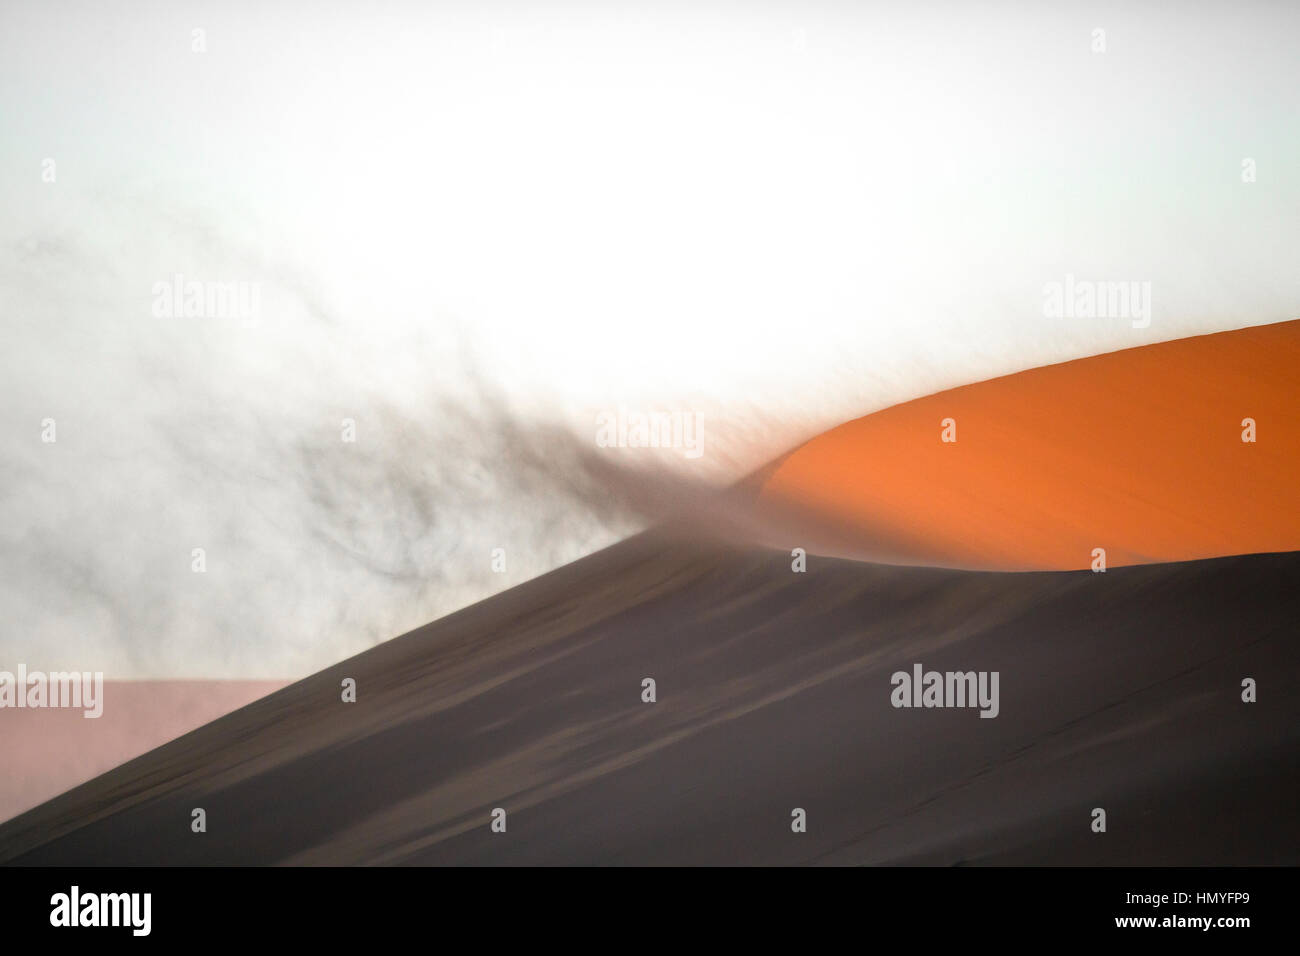 Sand Abblasen einer Sanddüne Stockbild